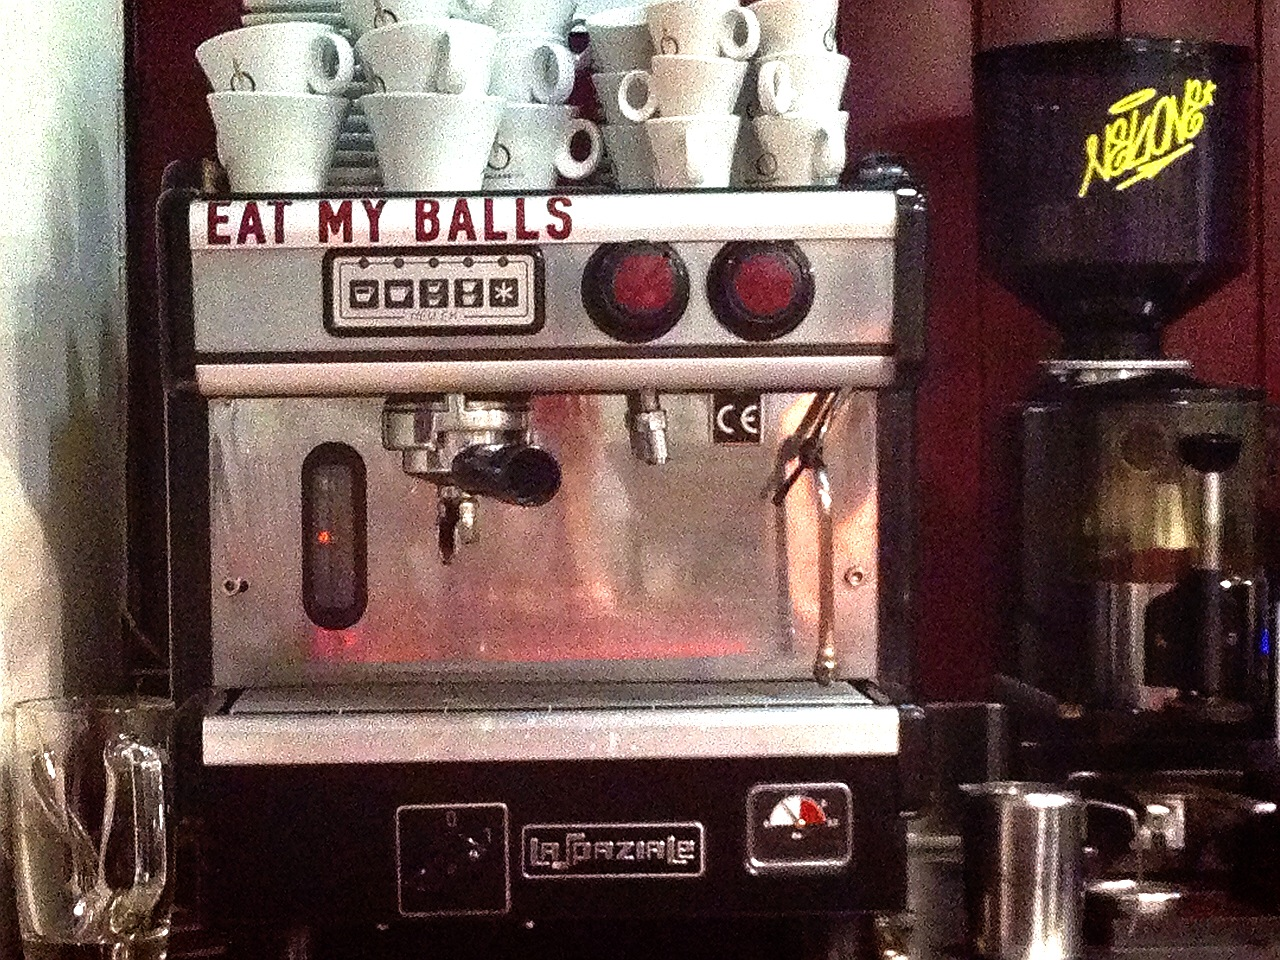 Bolero meatball